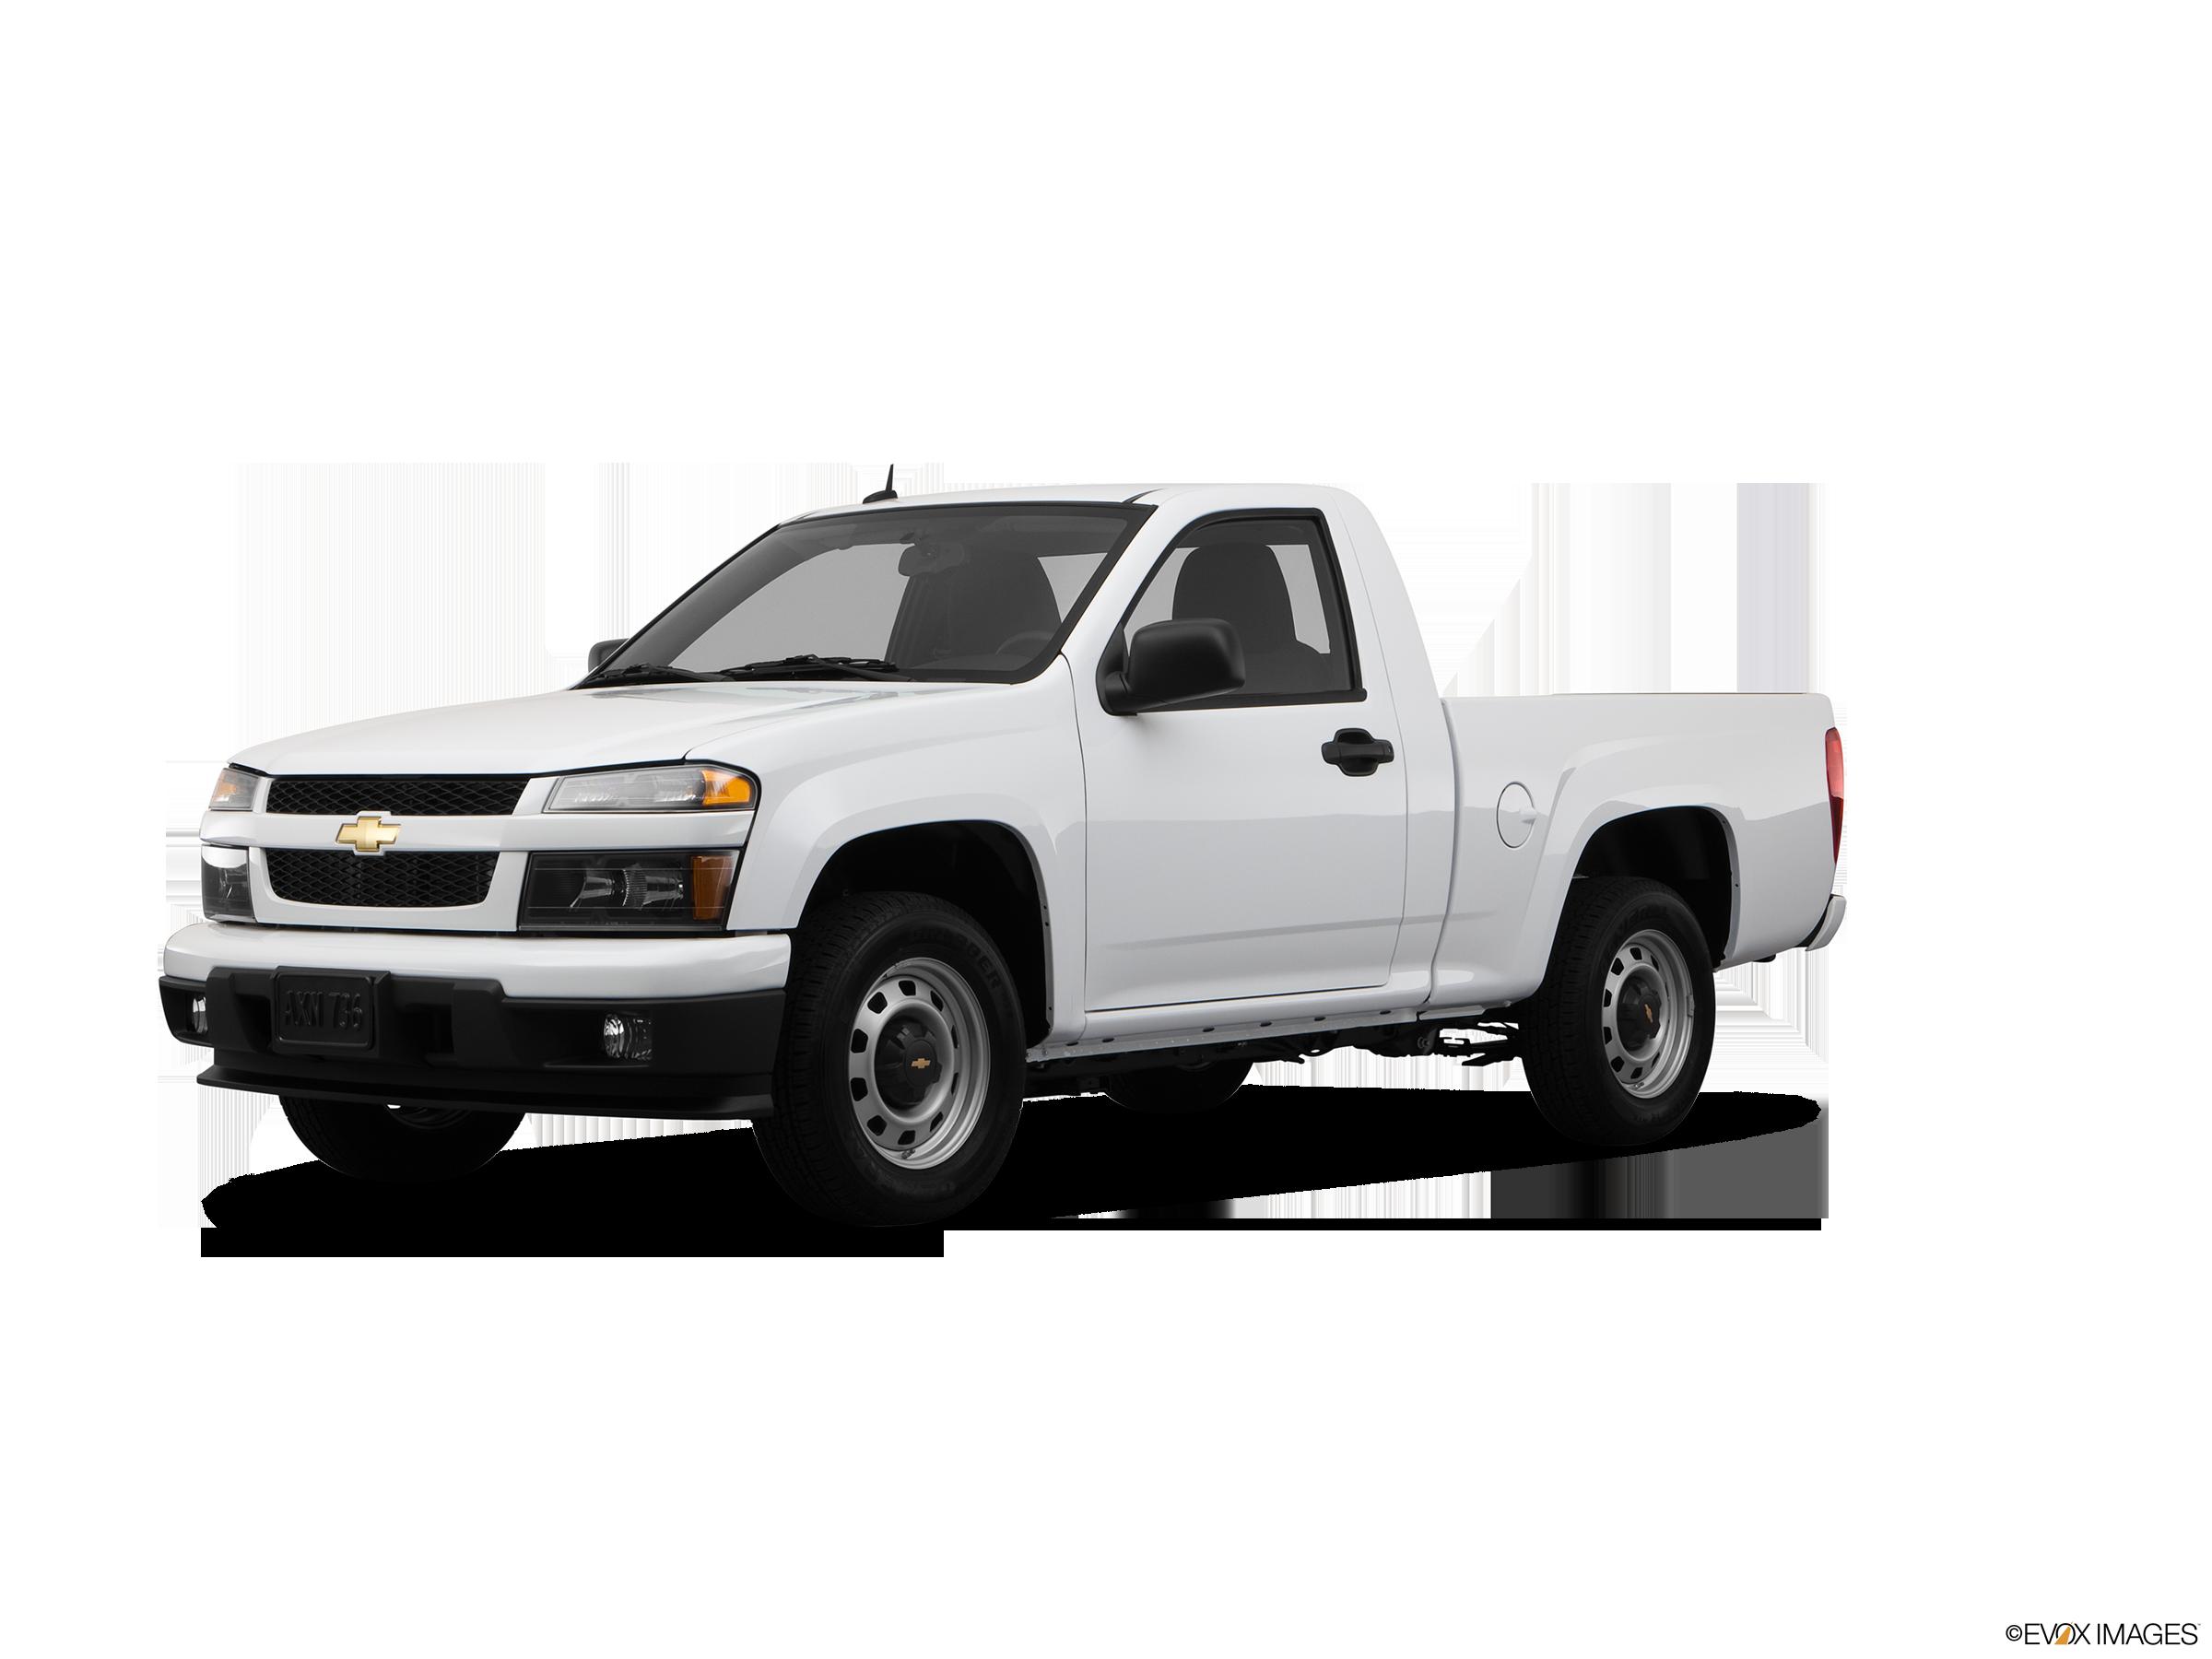 Kelebihan Chevrolet Colorado 2012 Harga